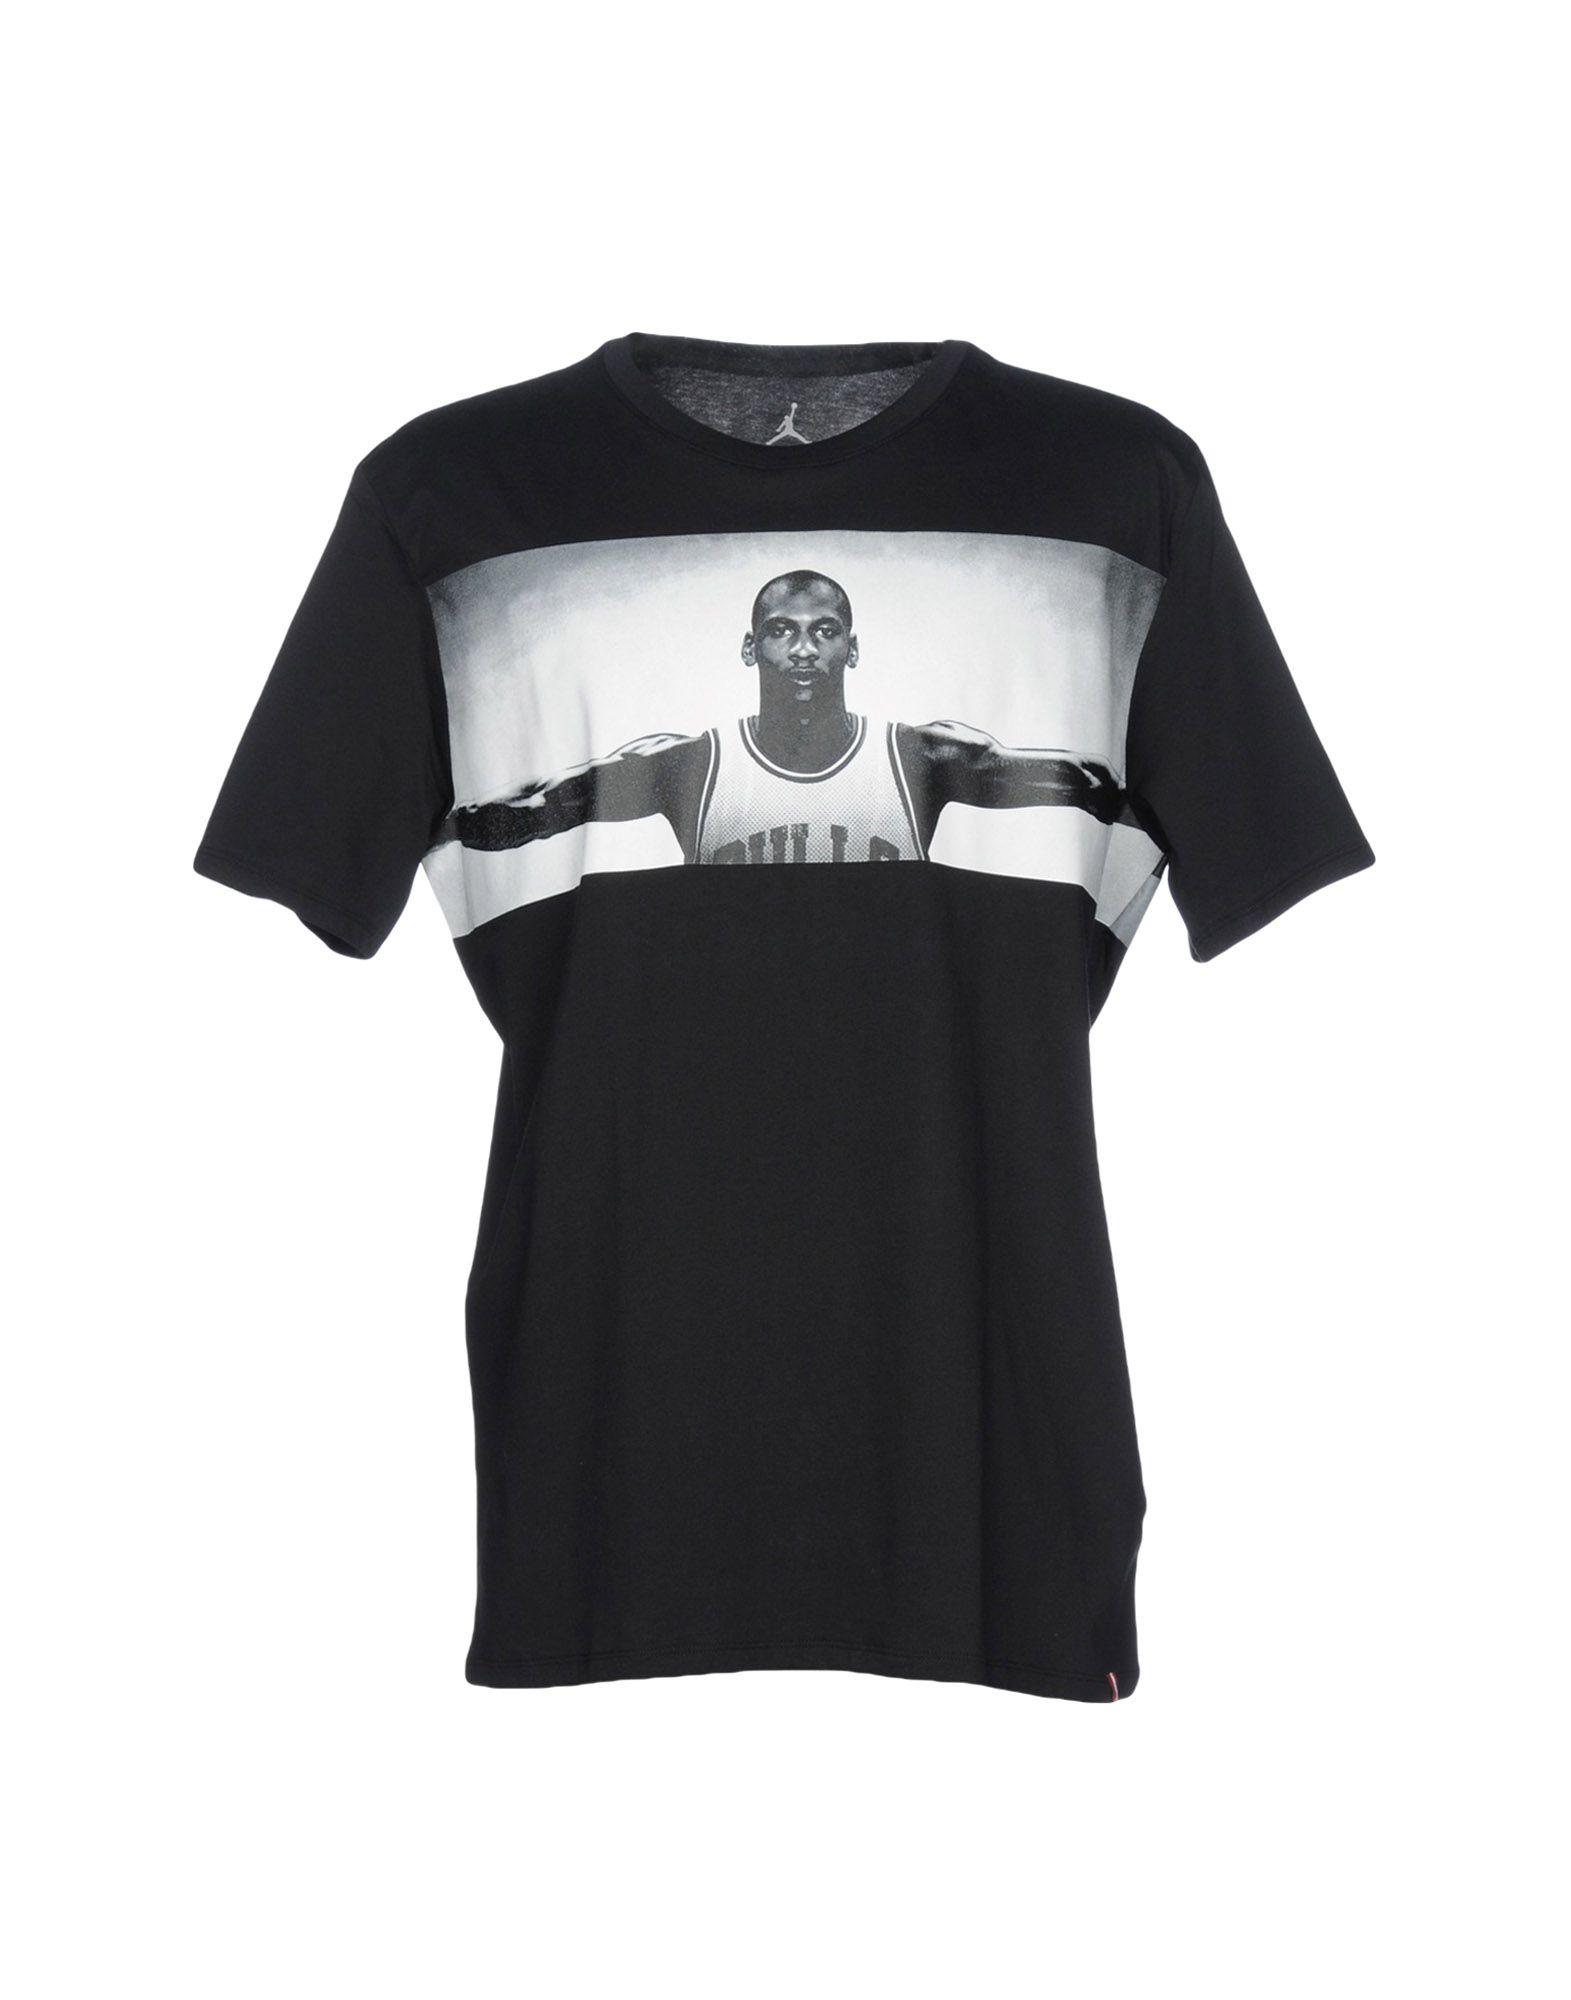 A buon mercato A buon mercato T-Shirt Jordan Jordan T-Shirt Uomo - 12172349TQ a795be